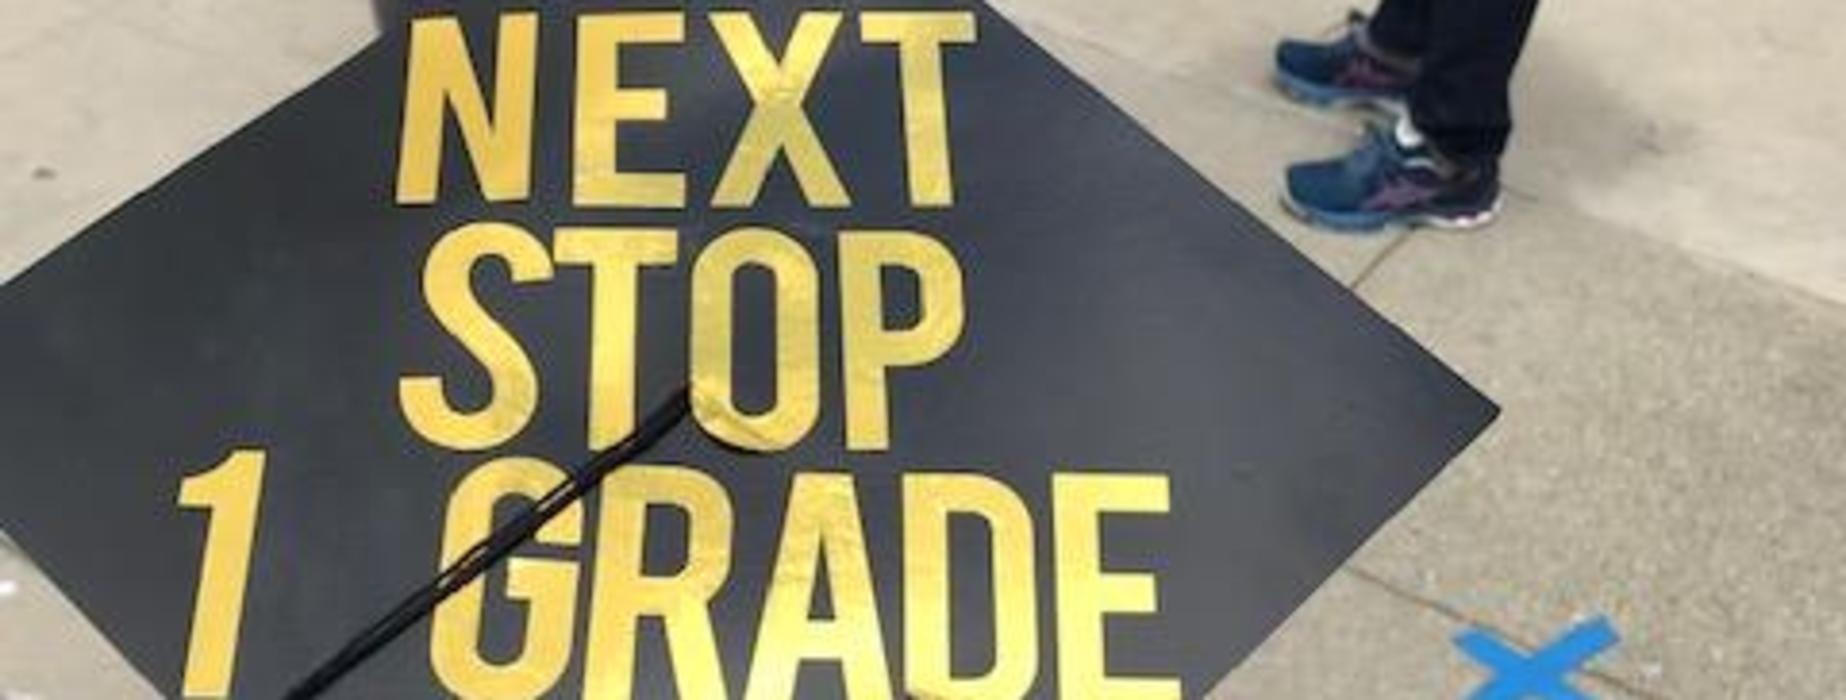 Next stop 1 Grade Cap